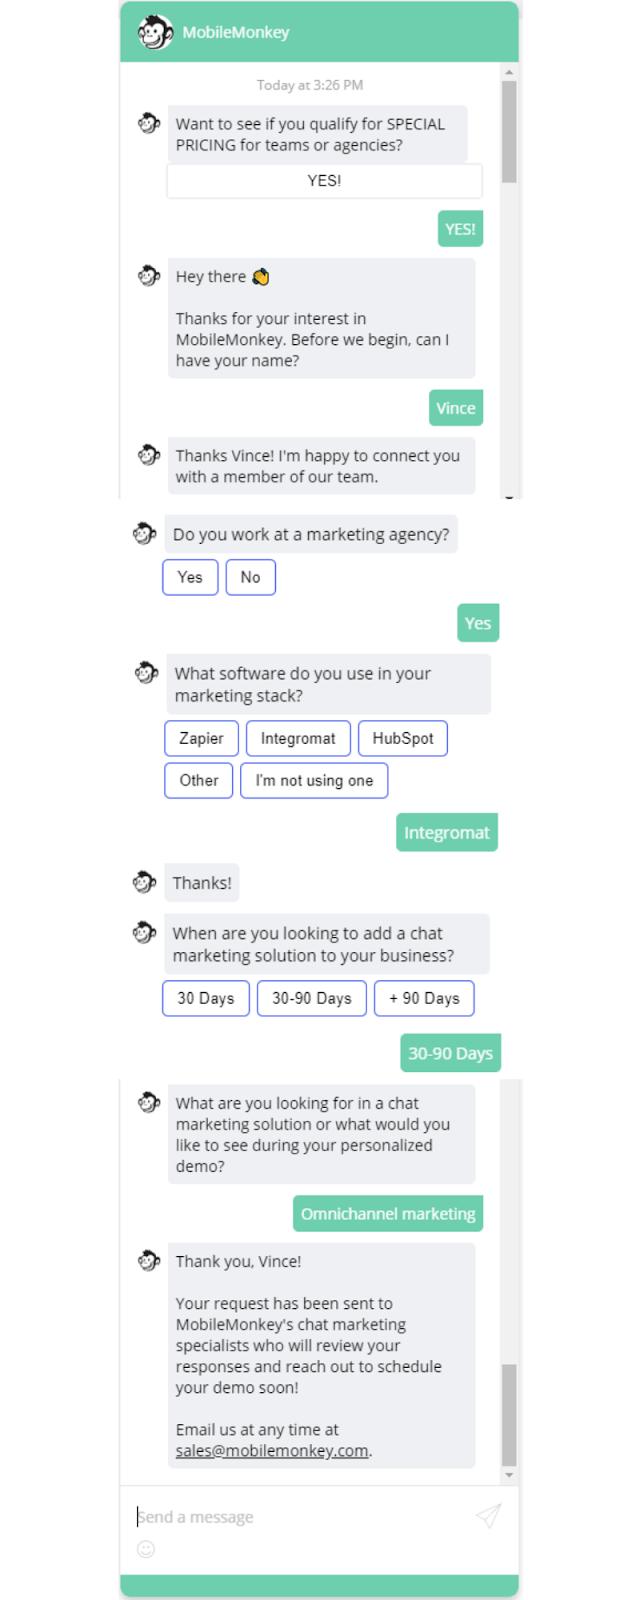 chatbot marketing gathering feedback and data